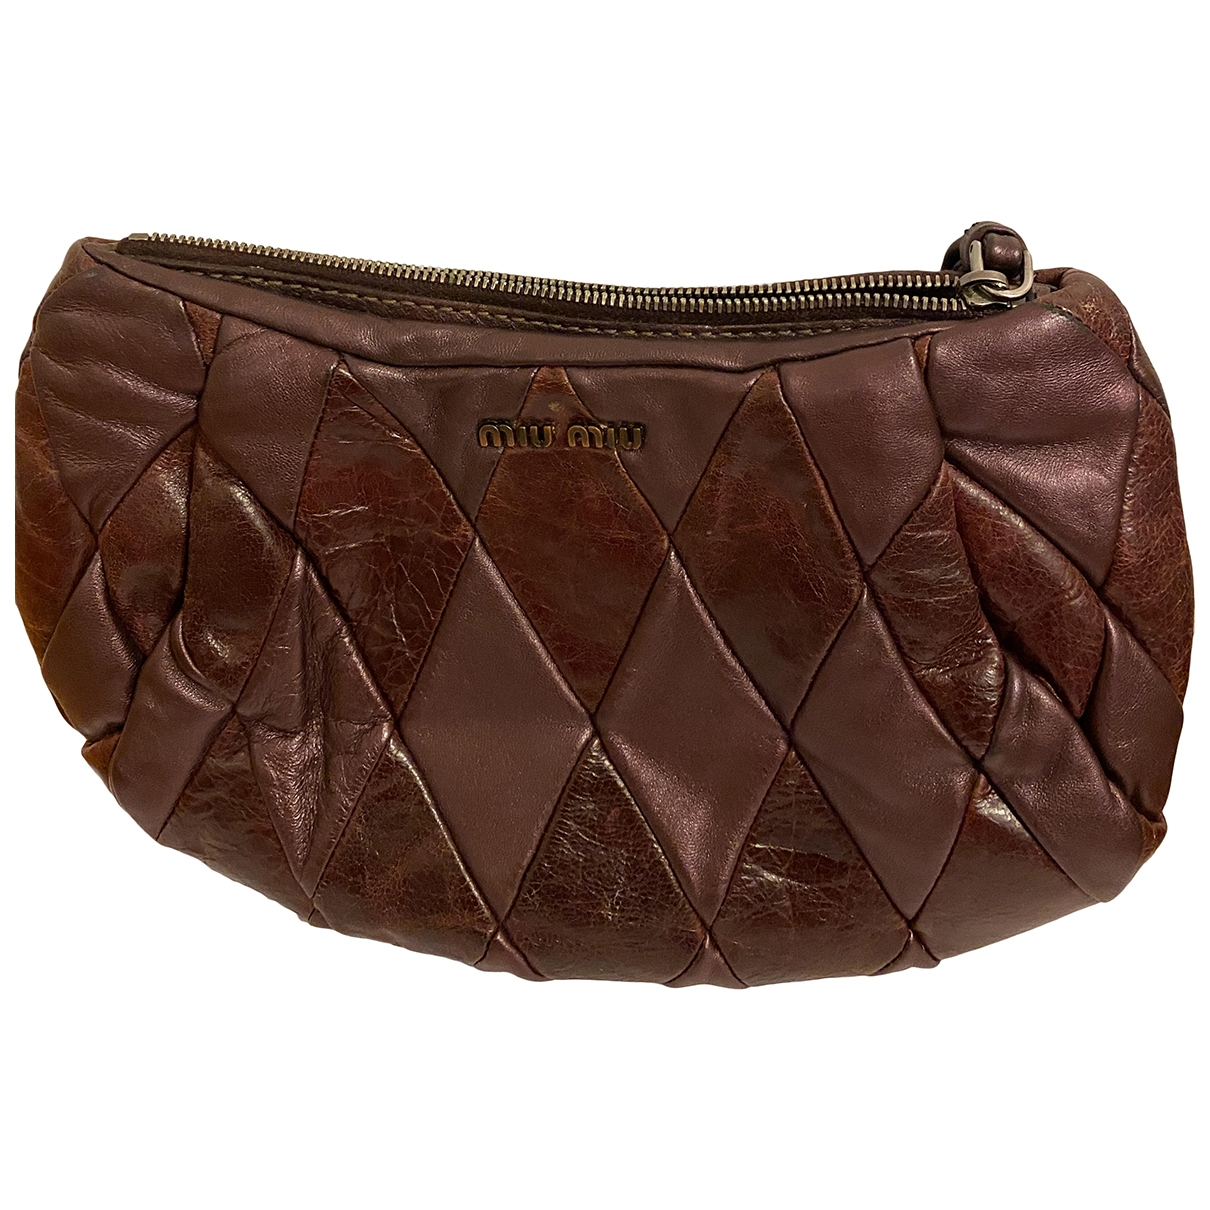 Miu Miu \N Burgundy Leather Clutch bag for Women \N